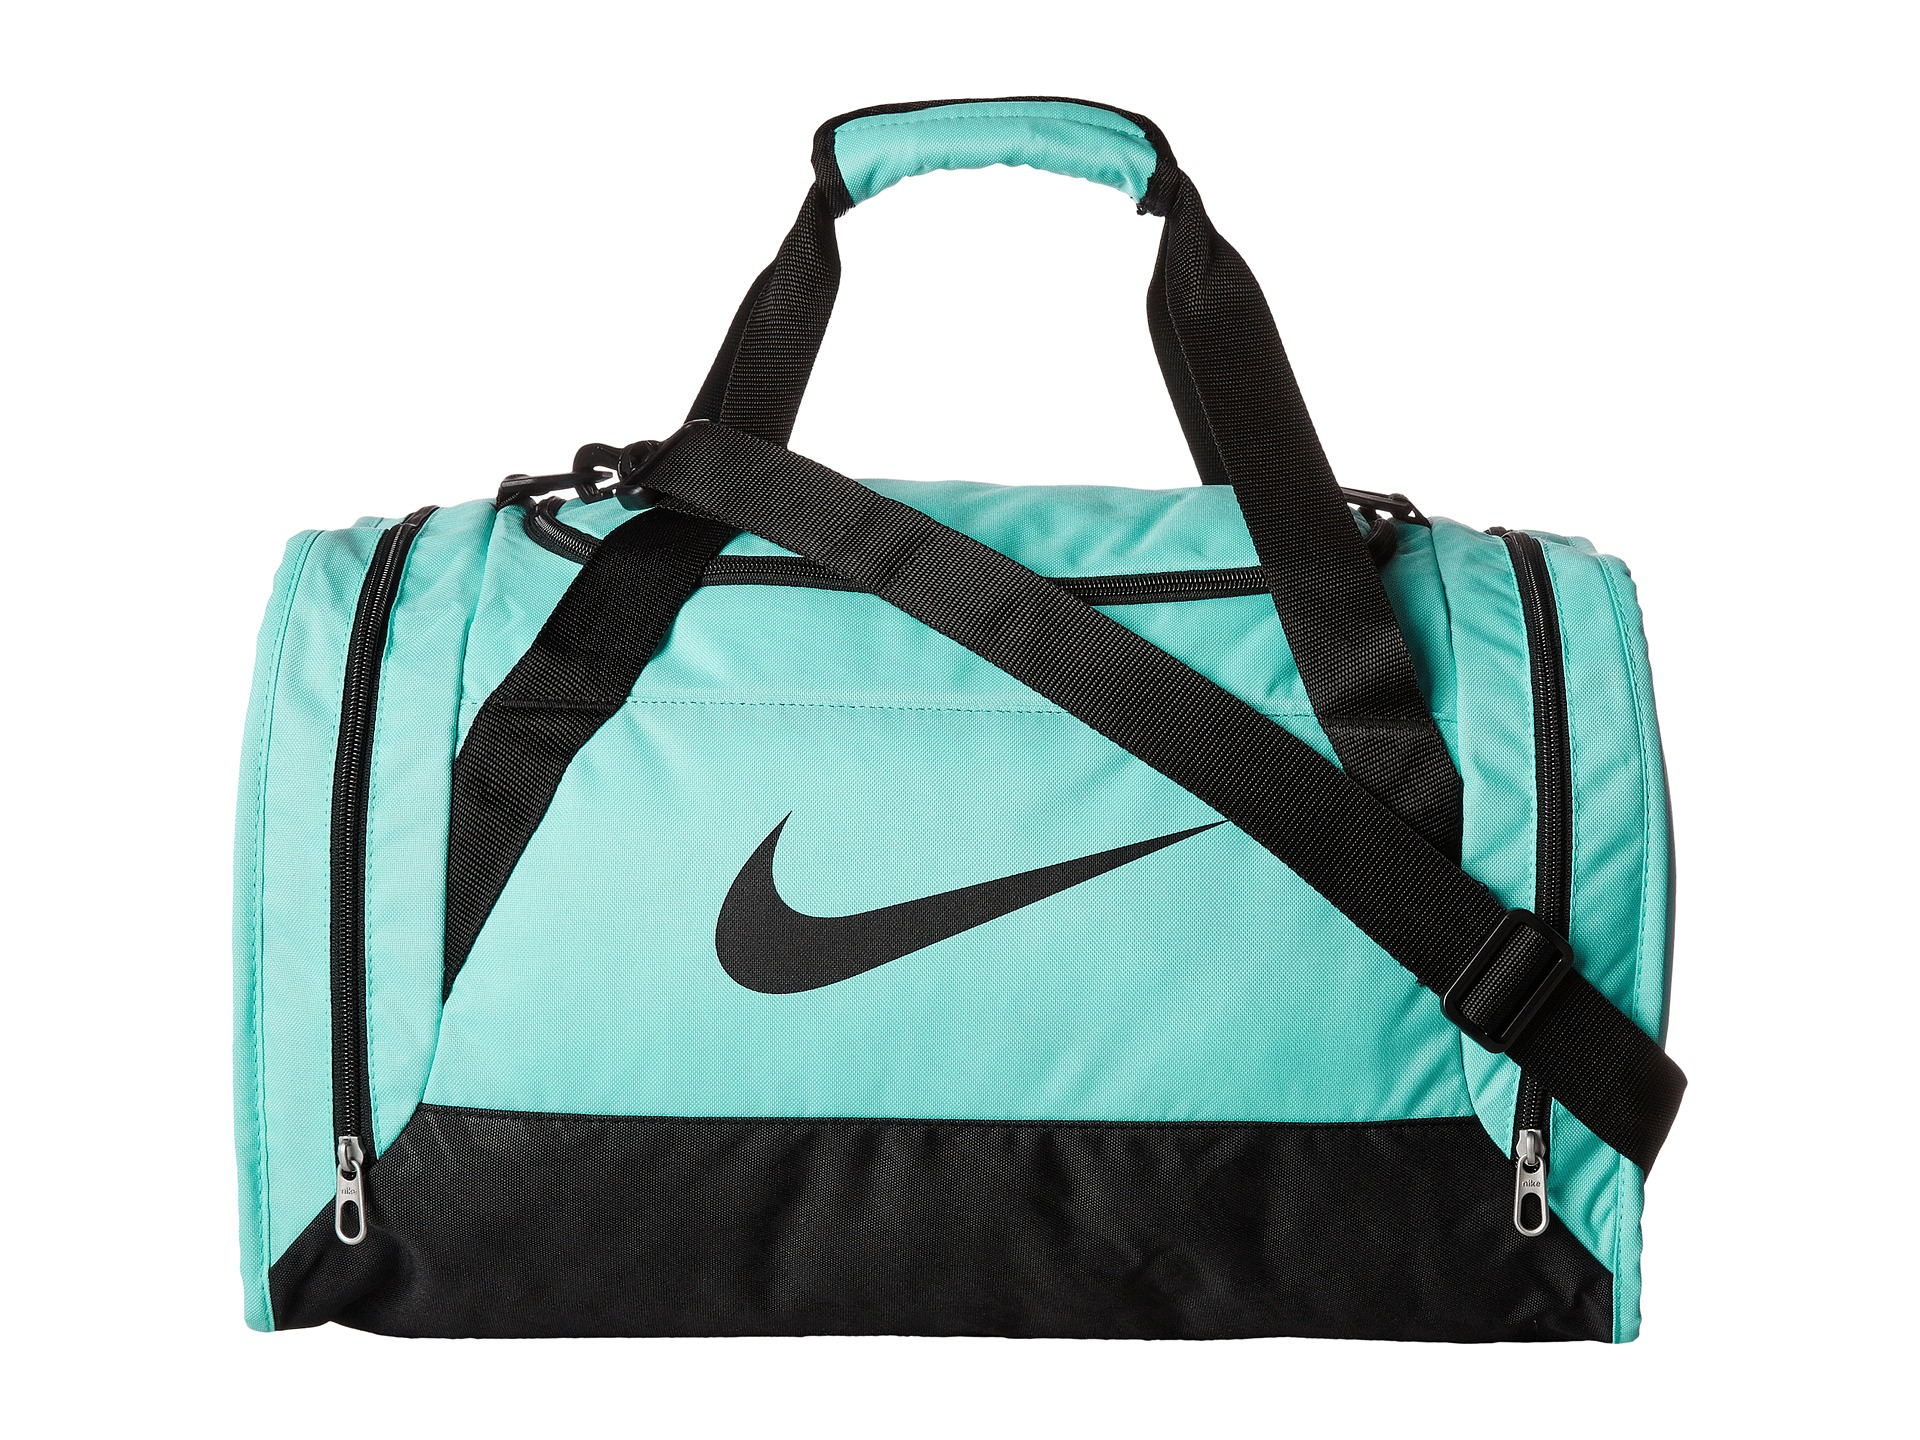 057d648e2776 Lyst - Nike Brasilia 6 Duffel Small in Blue